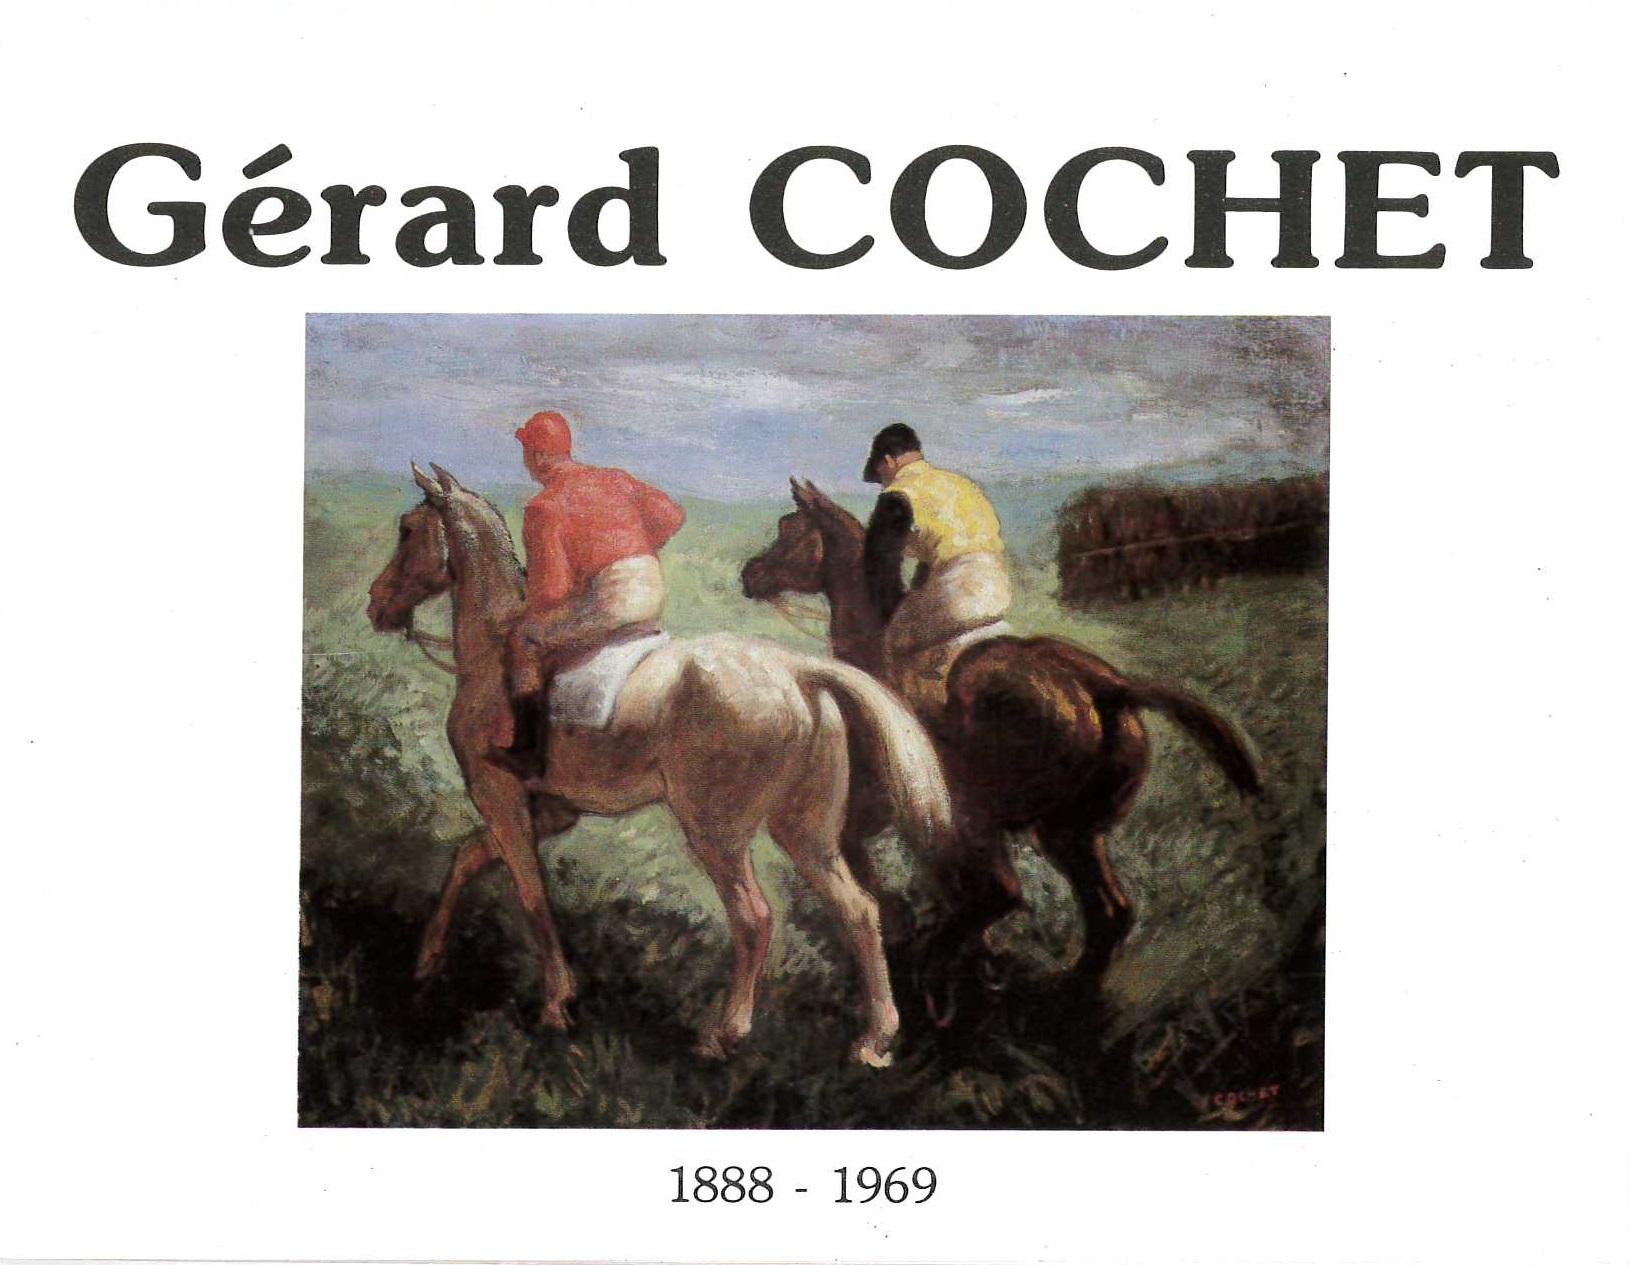 Gérard Cochet